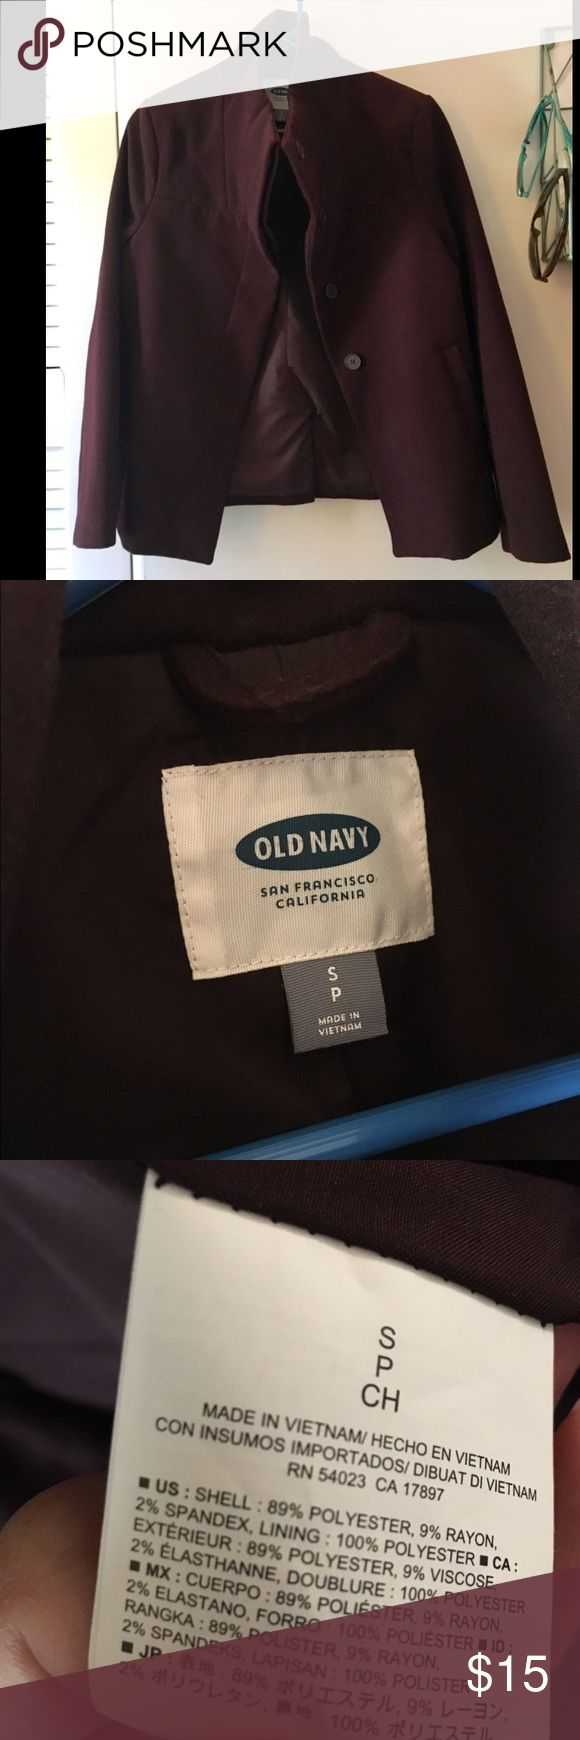 Old navy pea coat Aubergine pea coat from Old Navy. Very clean lines Old Navy Jackets & Coats Pea Coats